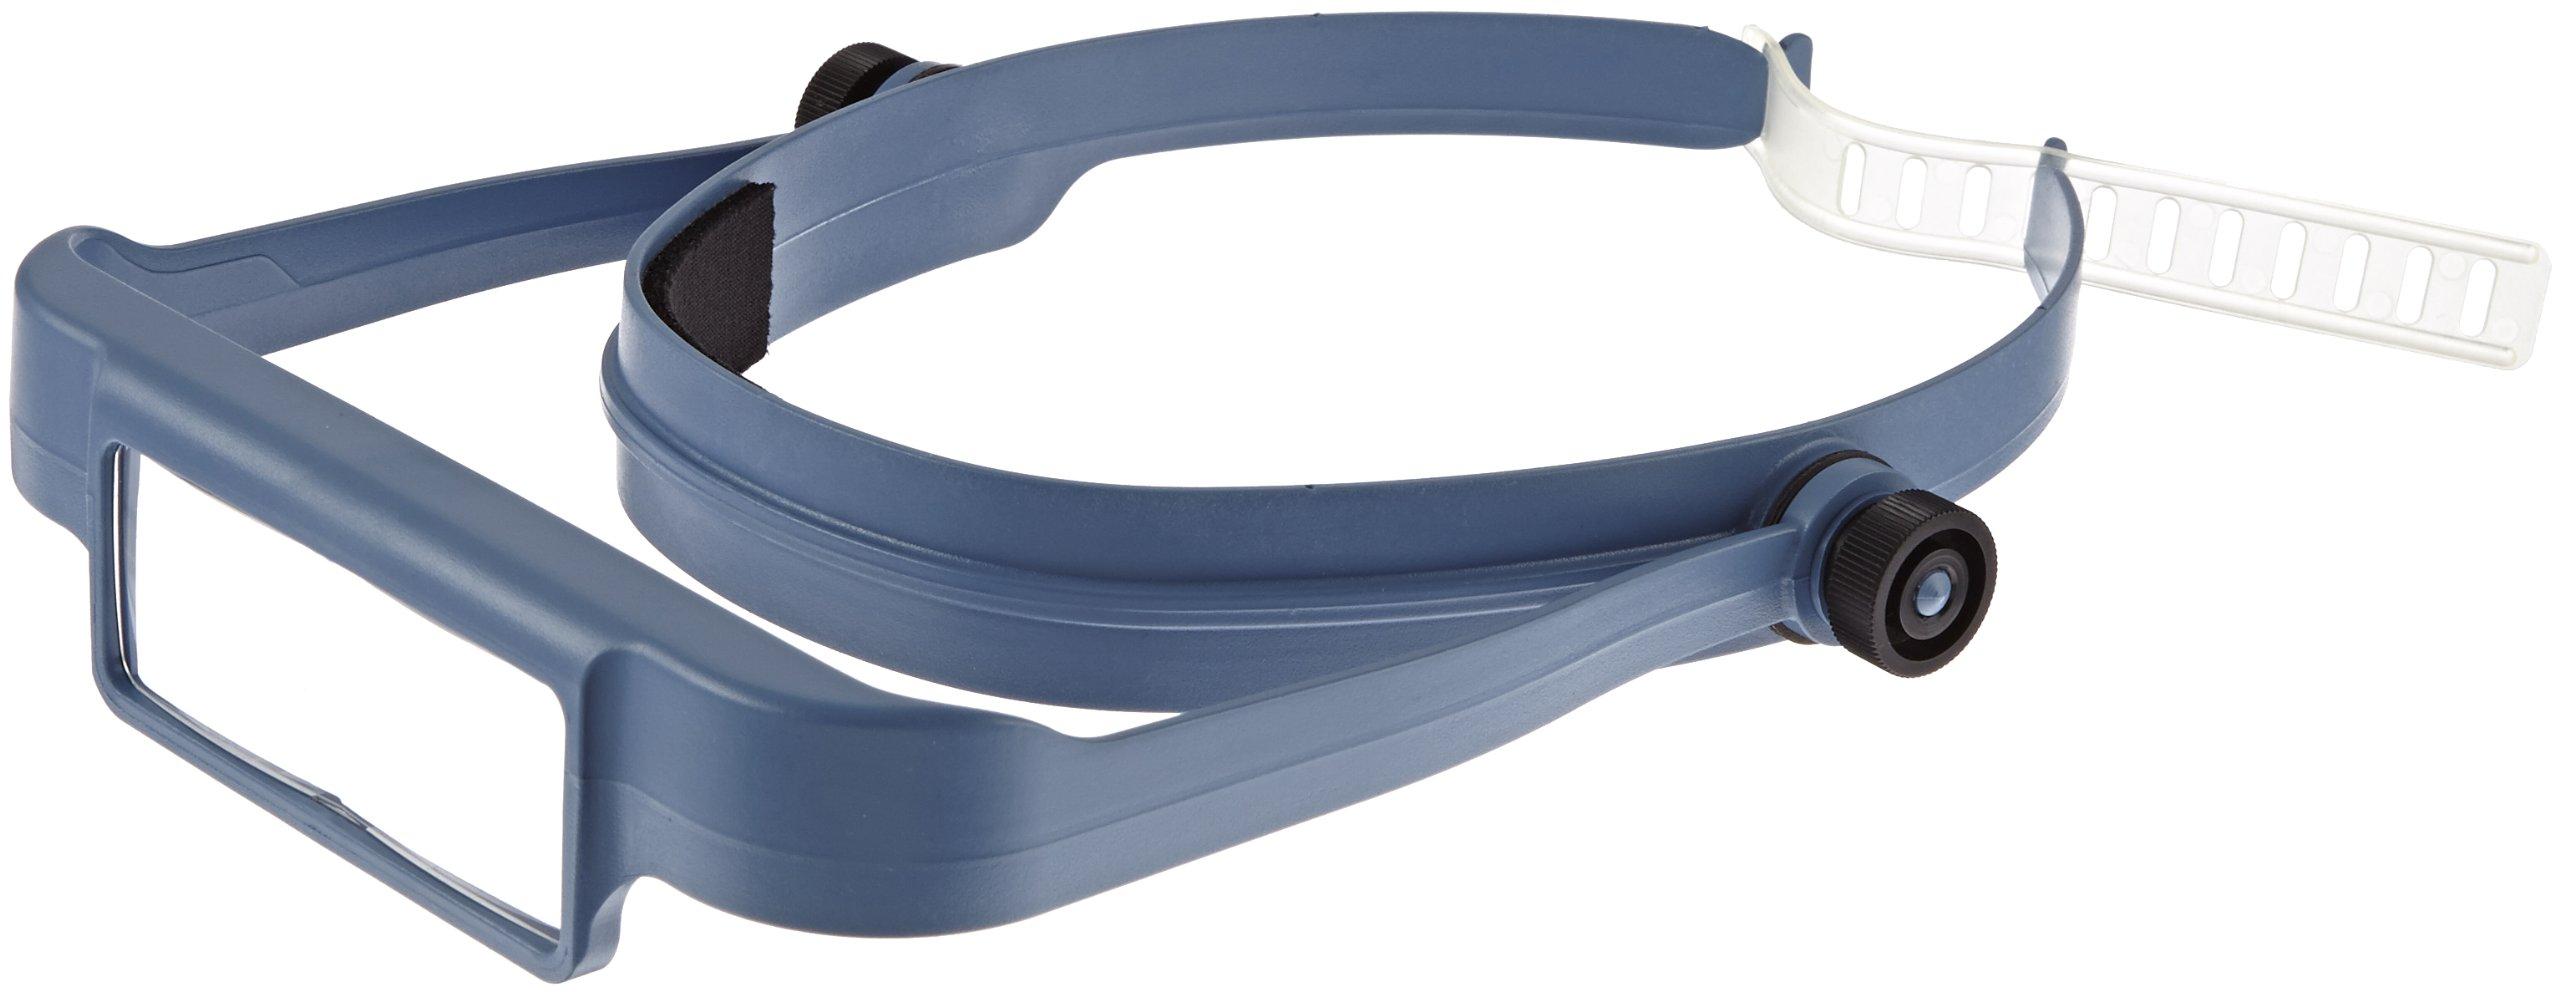 Donegan OSC OptiSIGHT Binocular Magnifying Visor, Blue by Donegan Optical